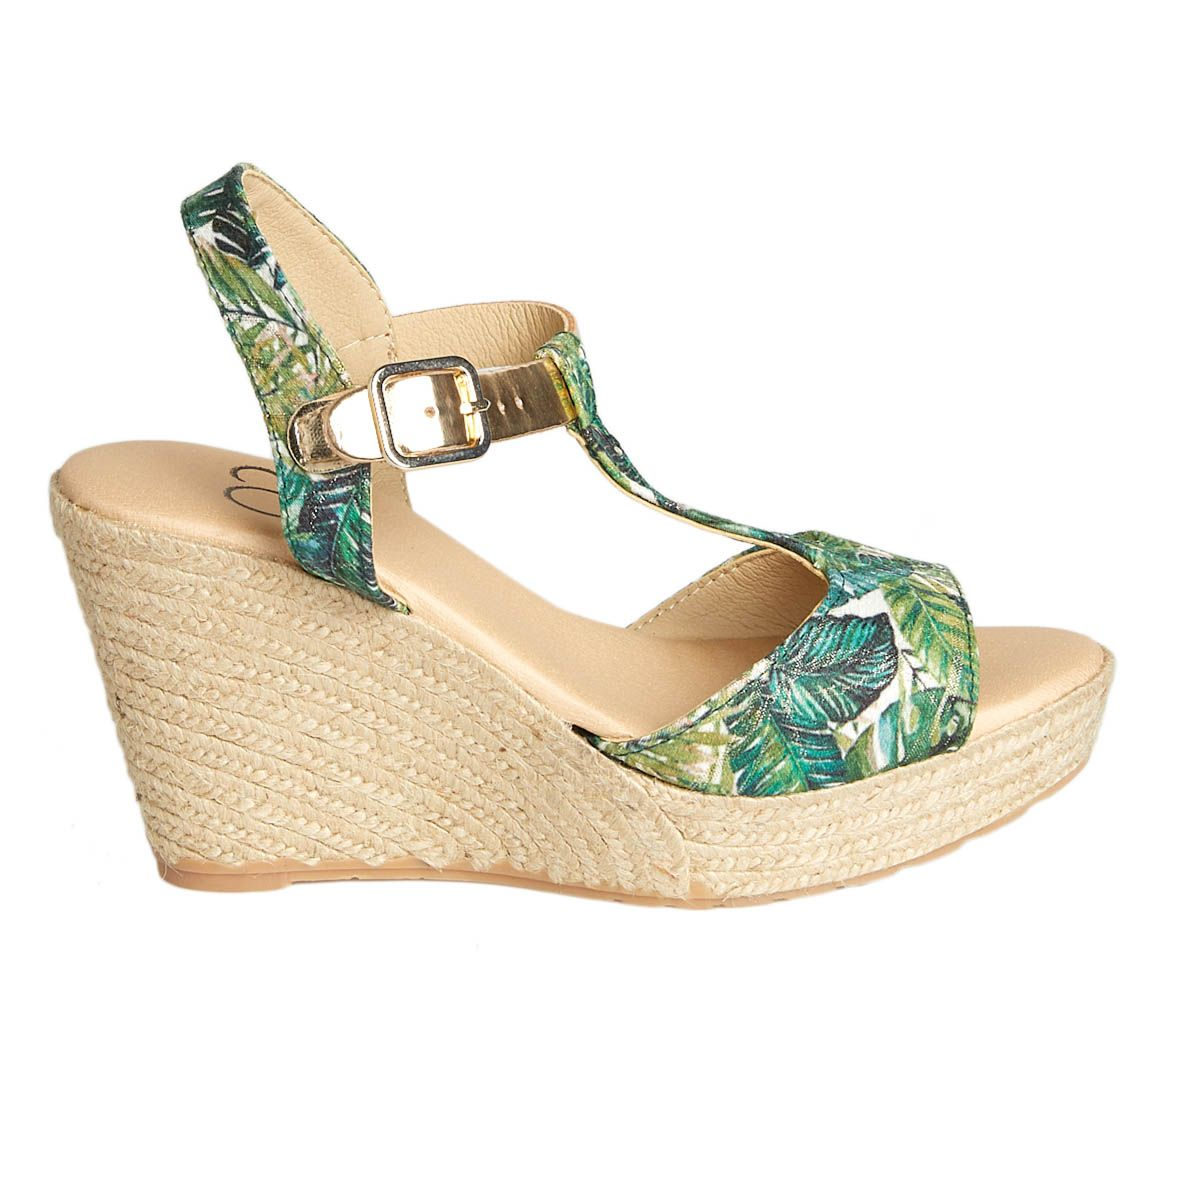 Leindia Sparto Wedge Sandal in Green